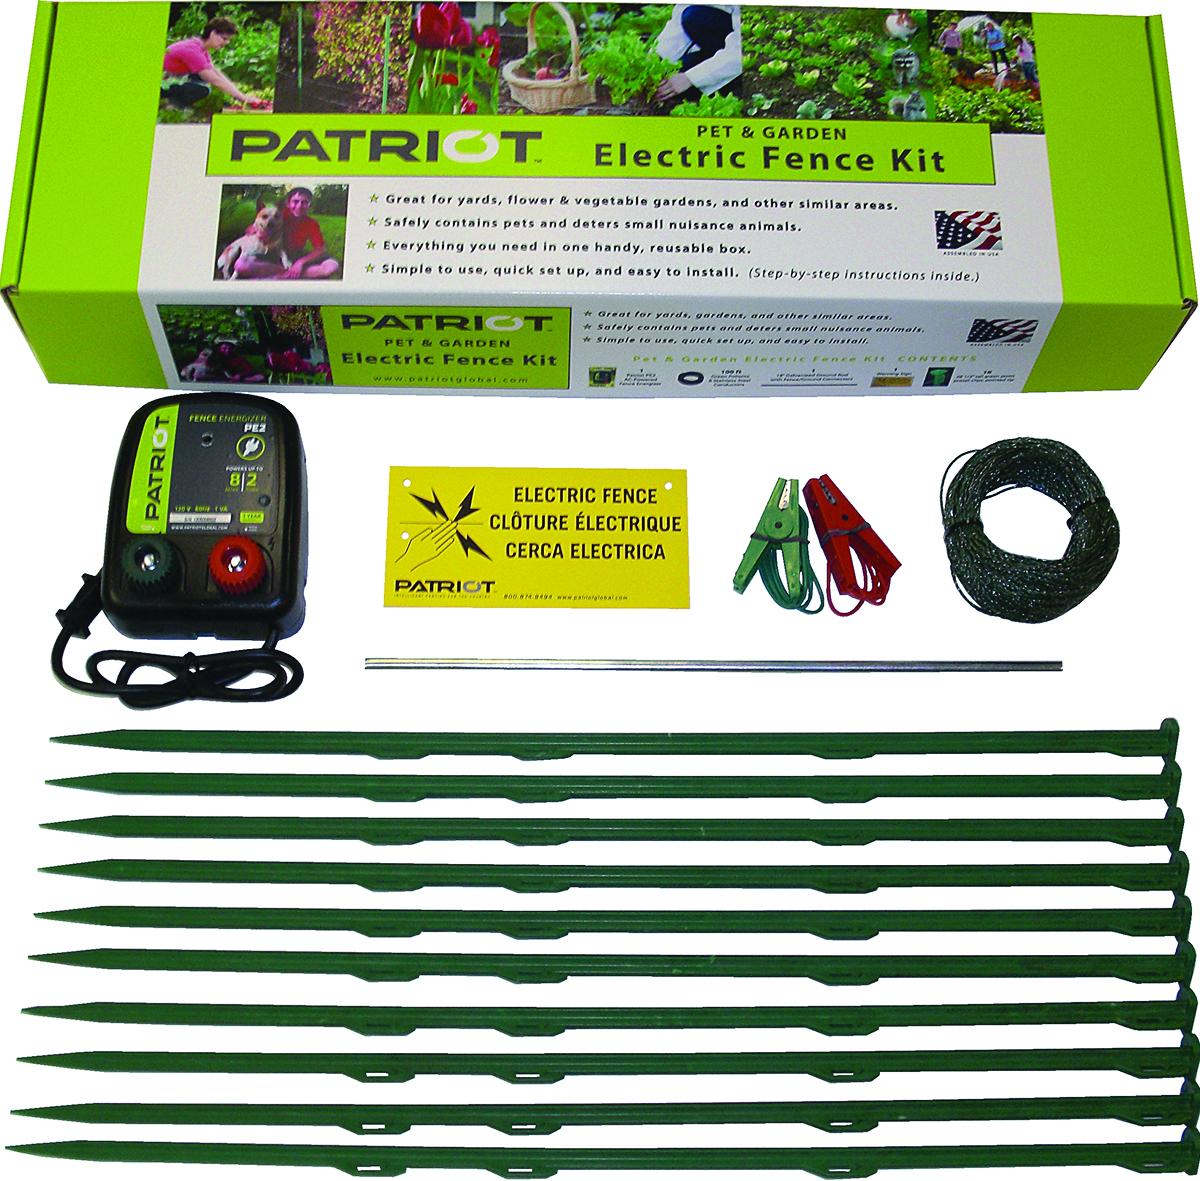 Pet Garden Electric Fence Kit